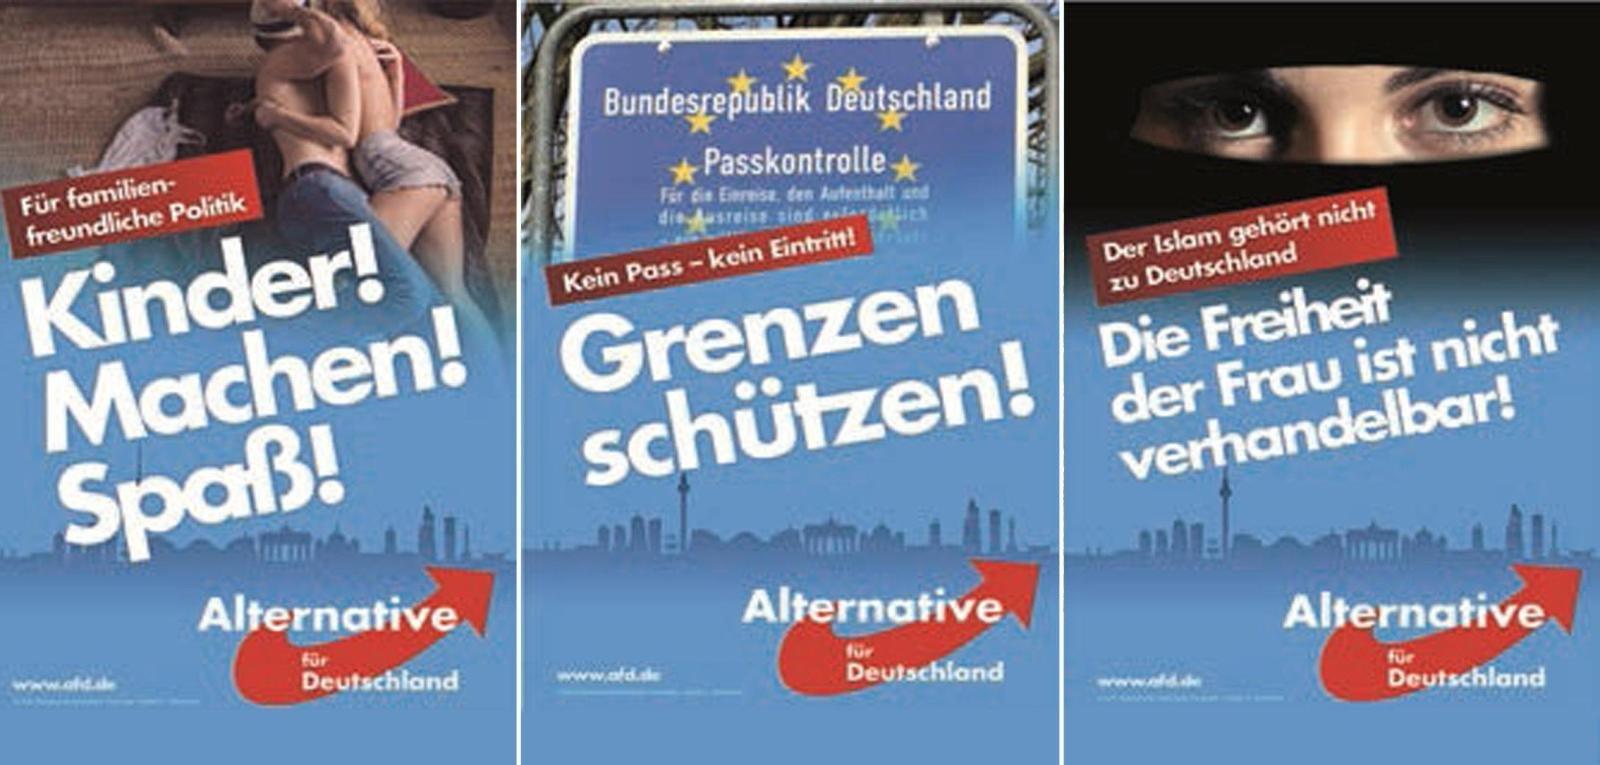 AfD Plakatmotive Wahlkampf Bayern